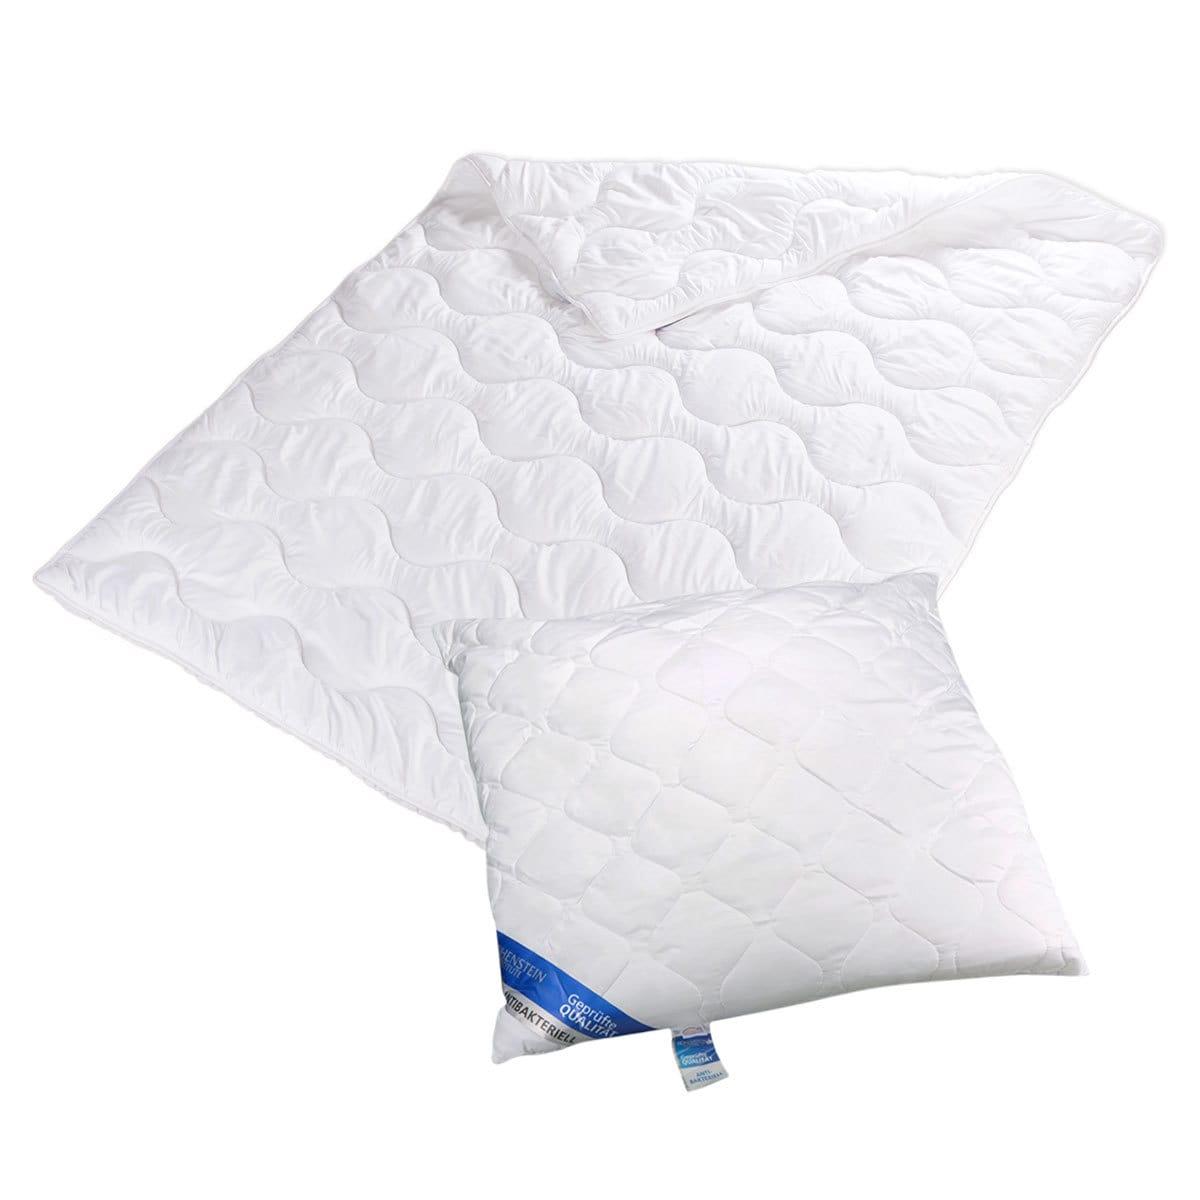 microfaser bettdecken deko trends schlafzimmer vorhang feng shui bettdecken waschbar testen. Black Bedroom Furniture Sets. Home Design Ideas